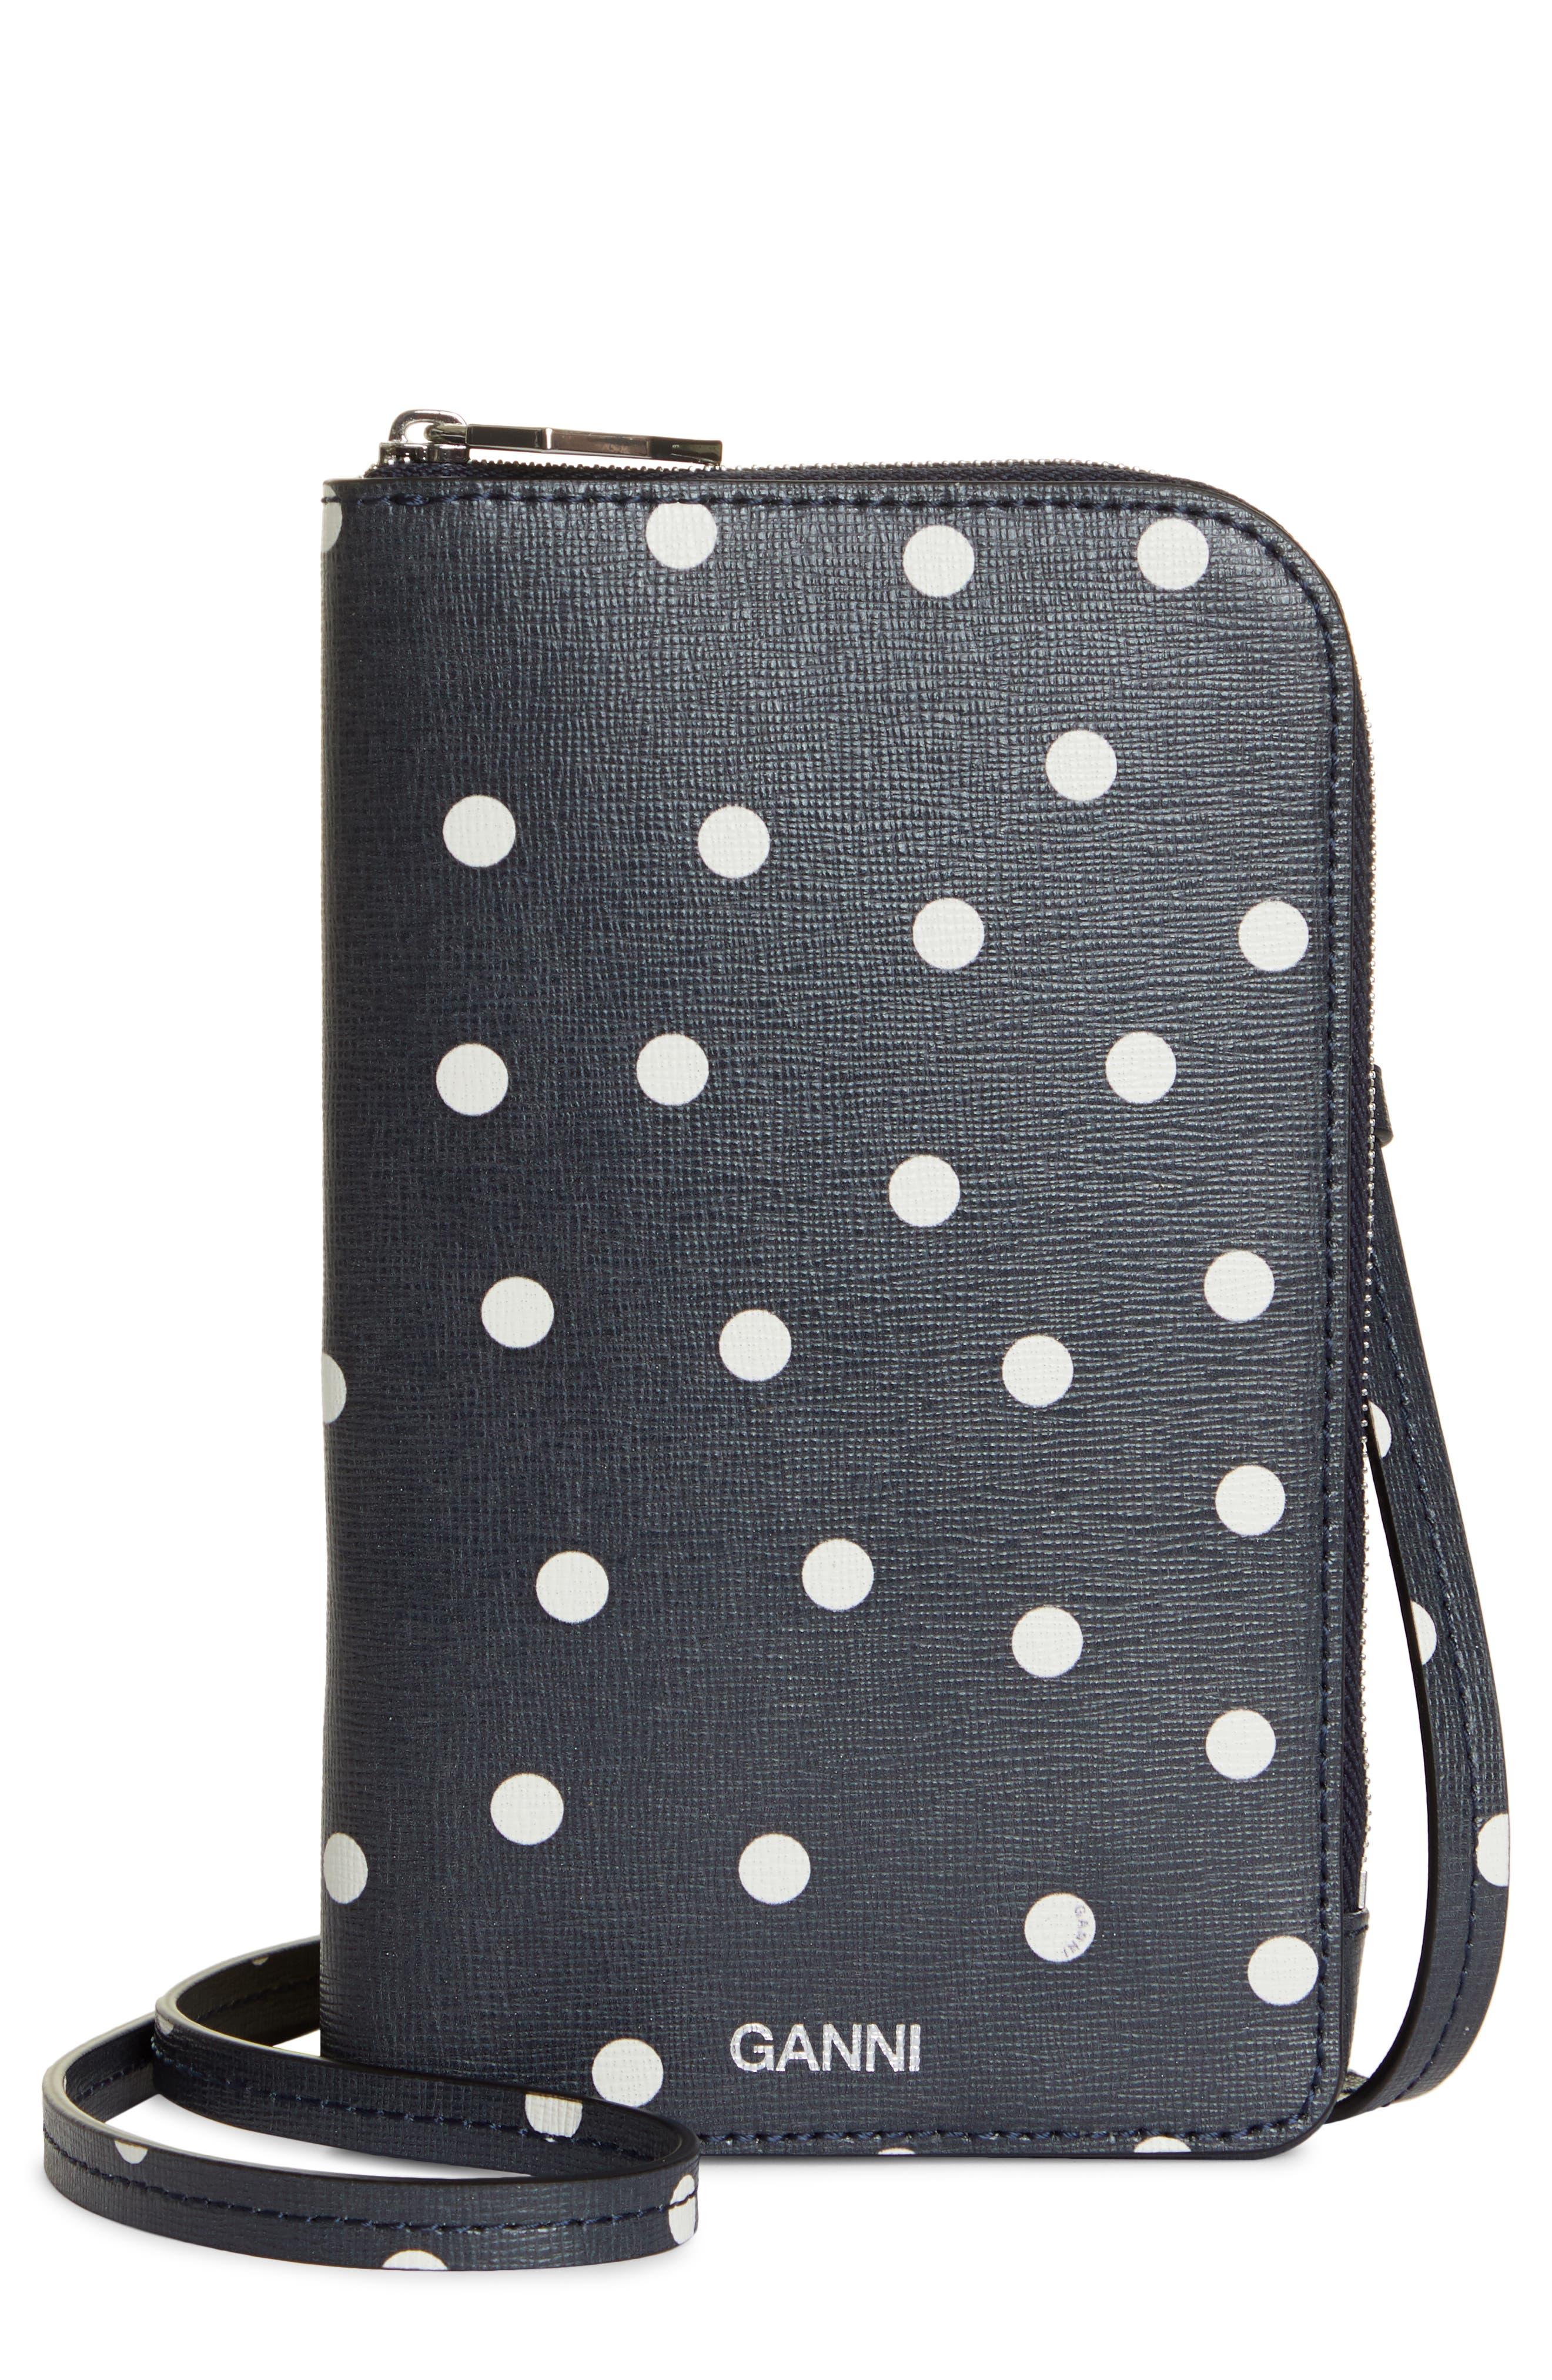 Ganni Print Leather Phone Crossbody Bag - Black